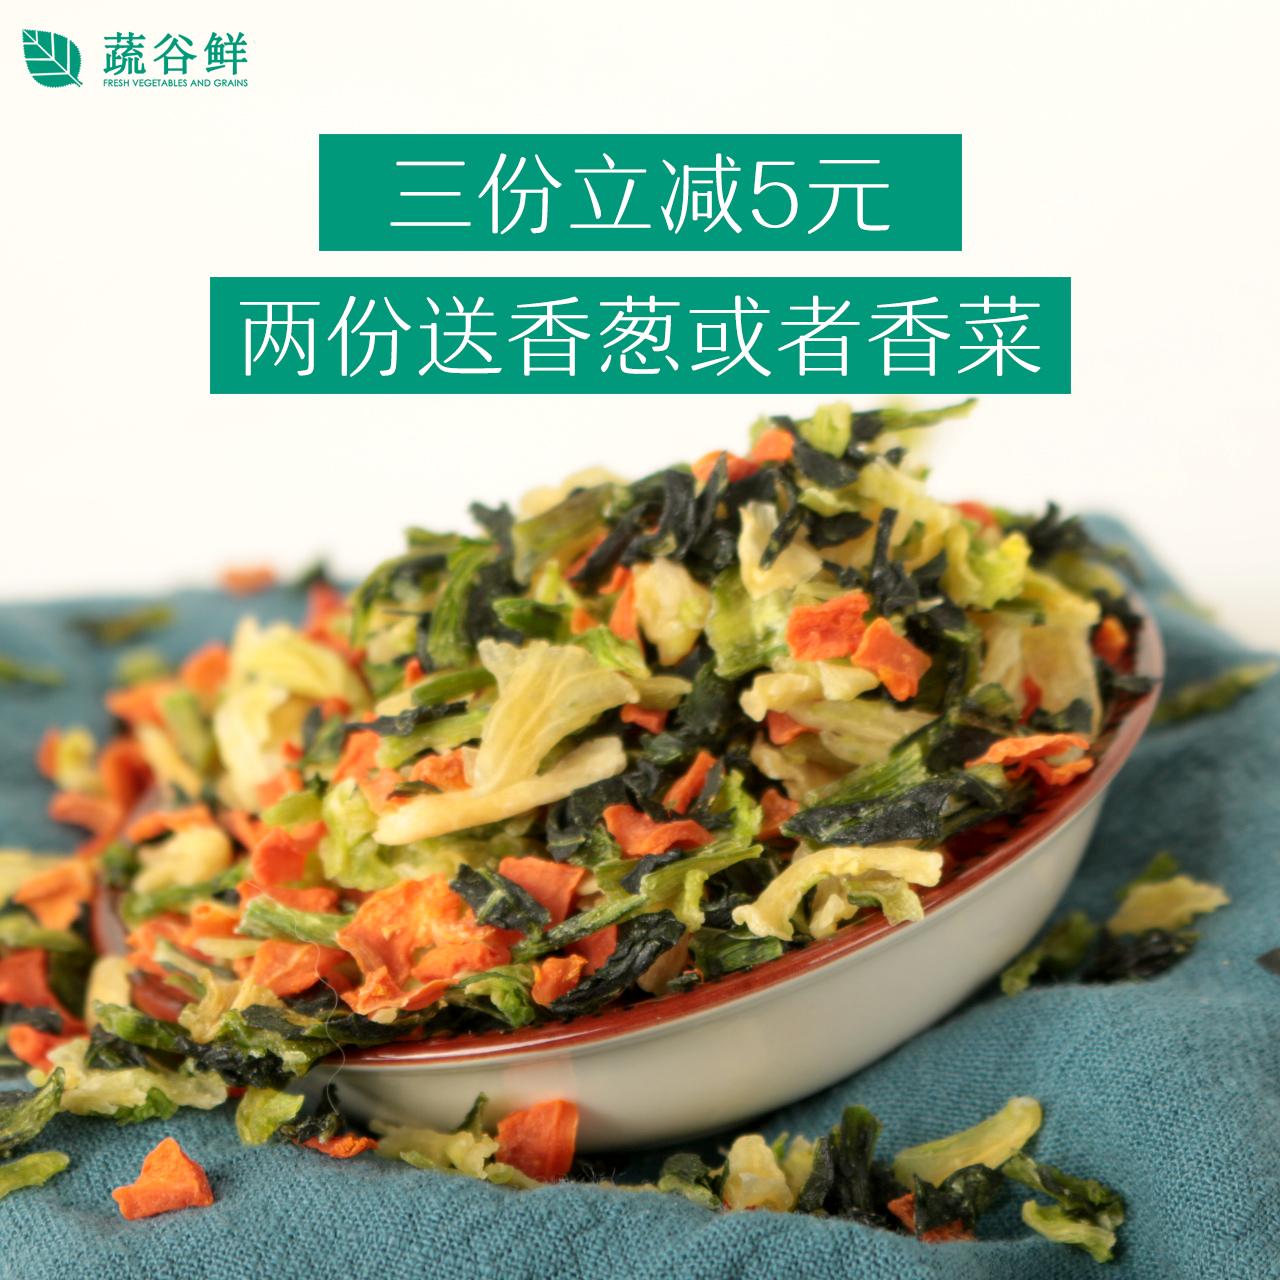 Dried vegetables, dehydrated vegetables, instant carrot, instant noodles, green vegetables, instant noodles, porridge